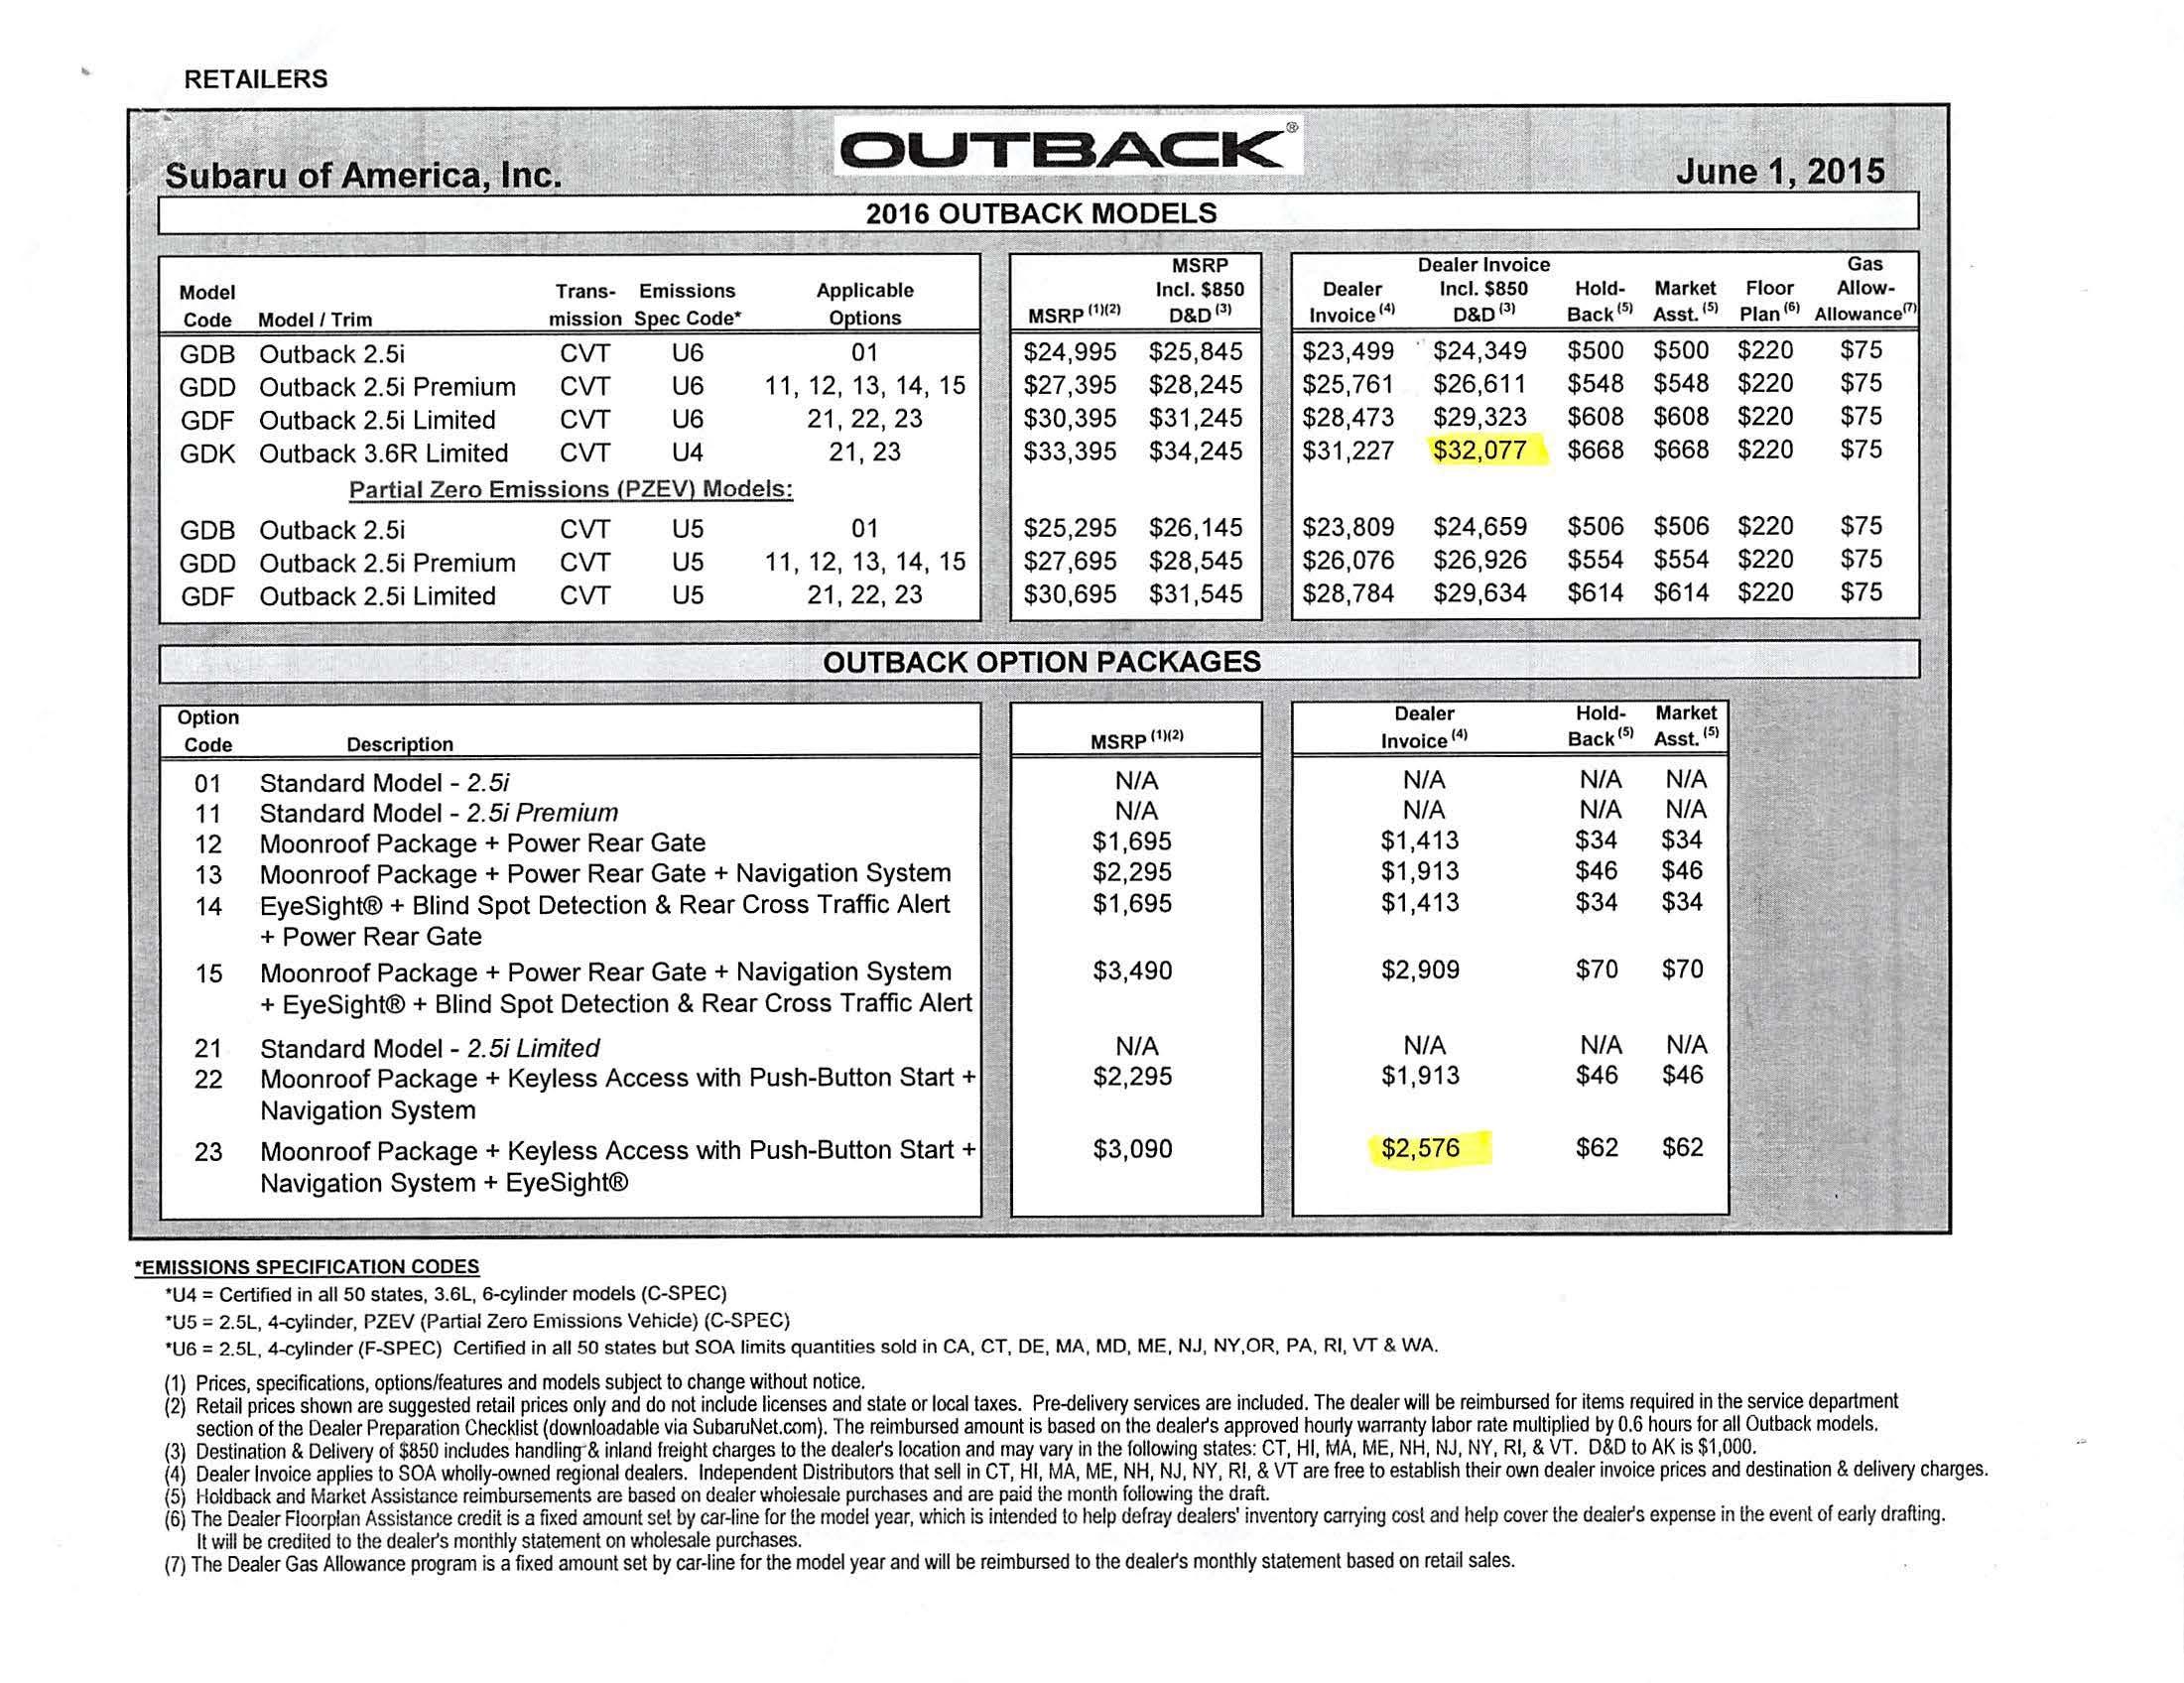 2015 Subaru Outback Invoice Price